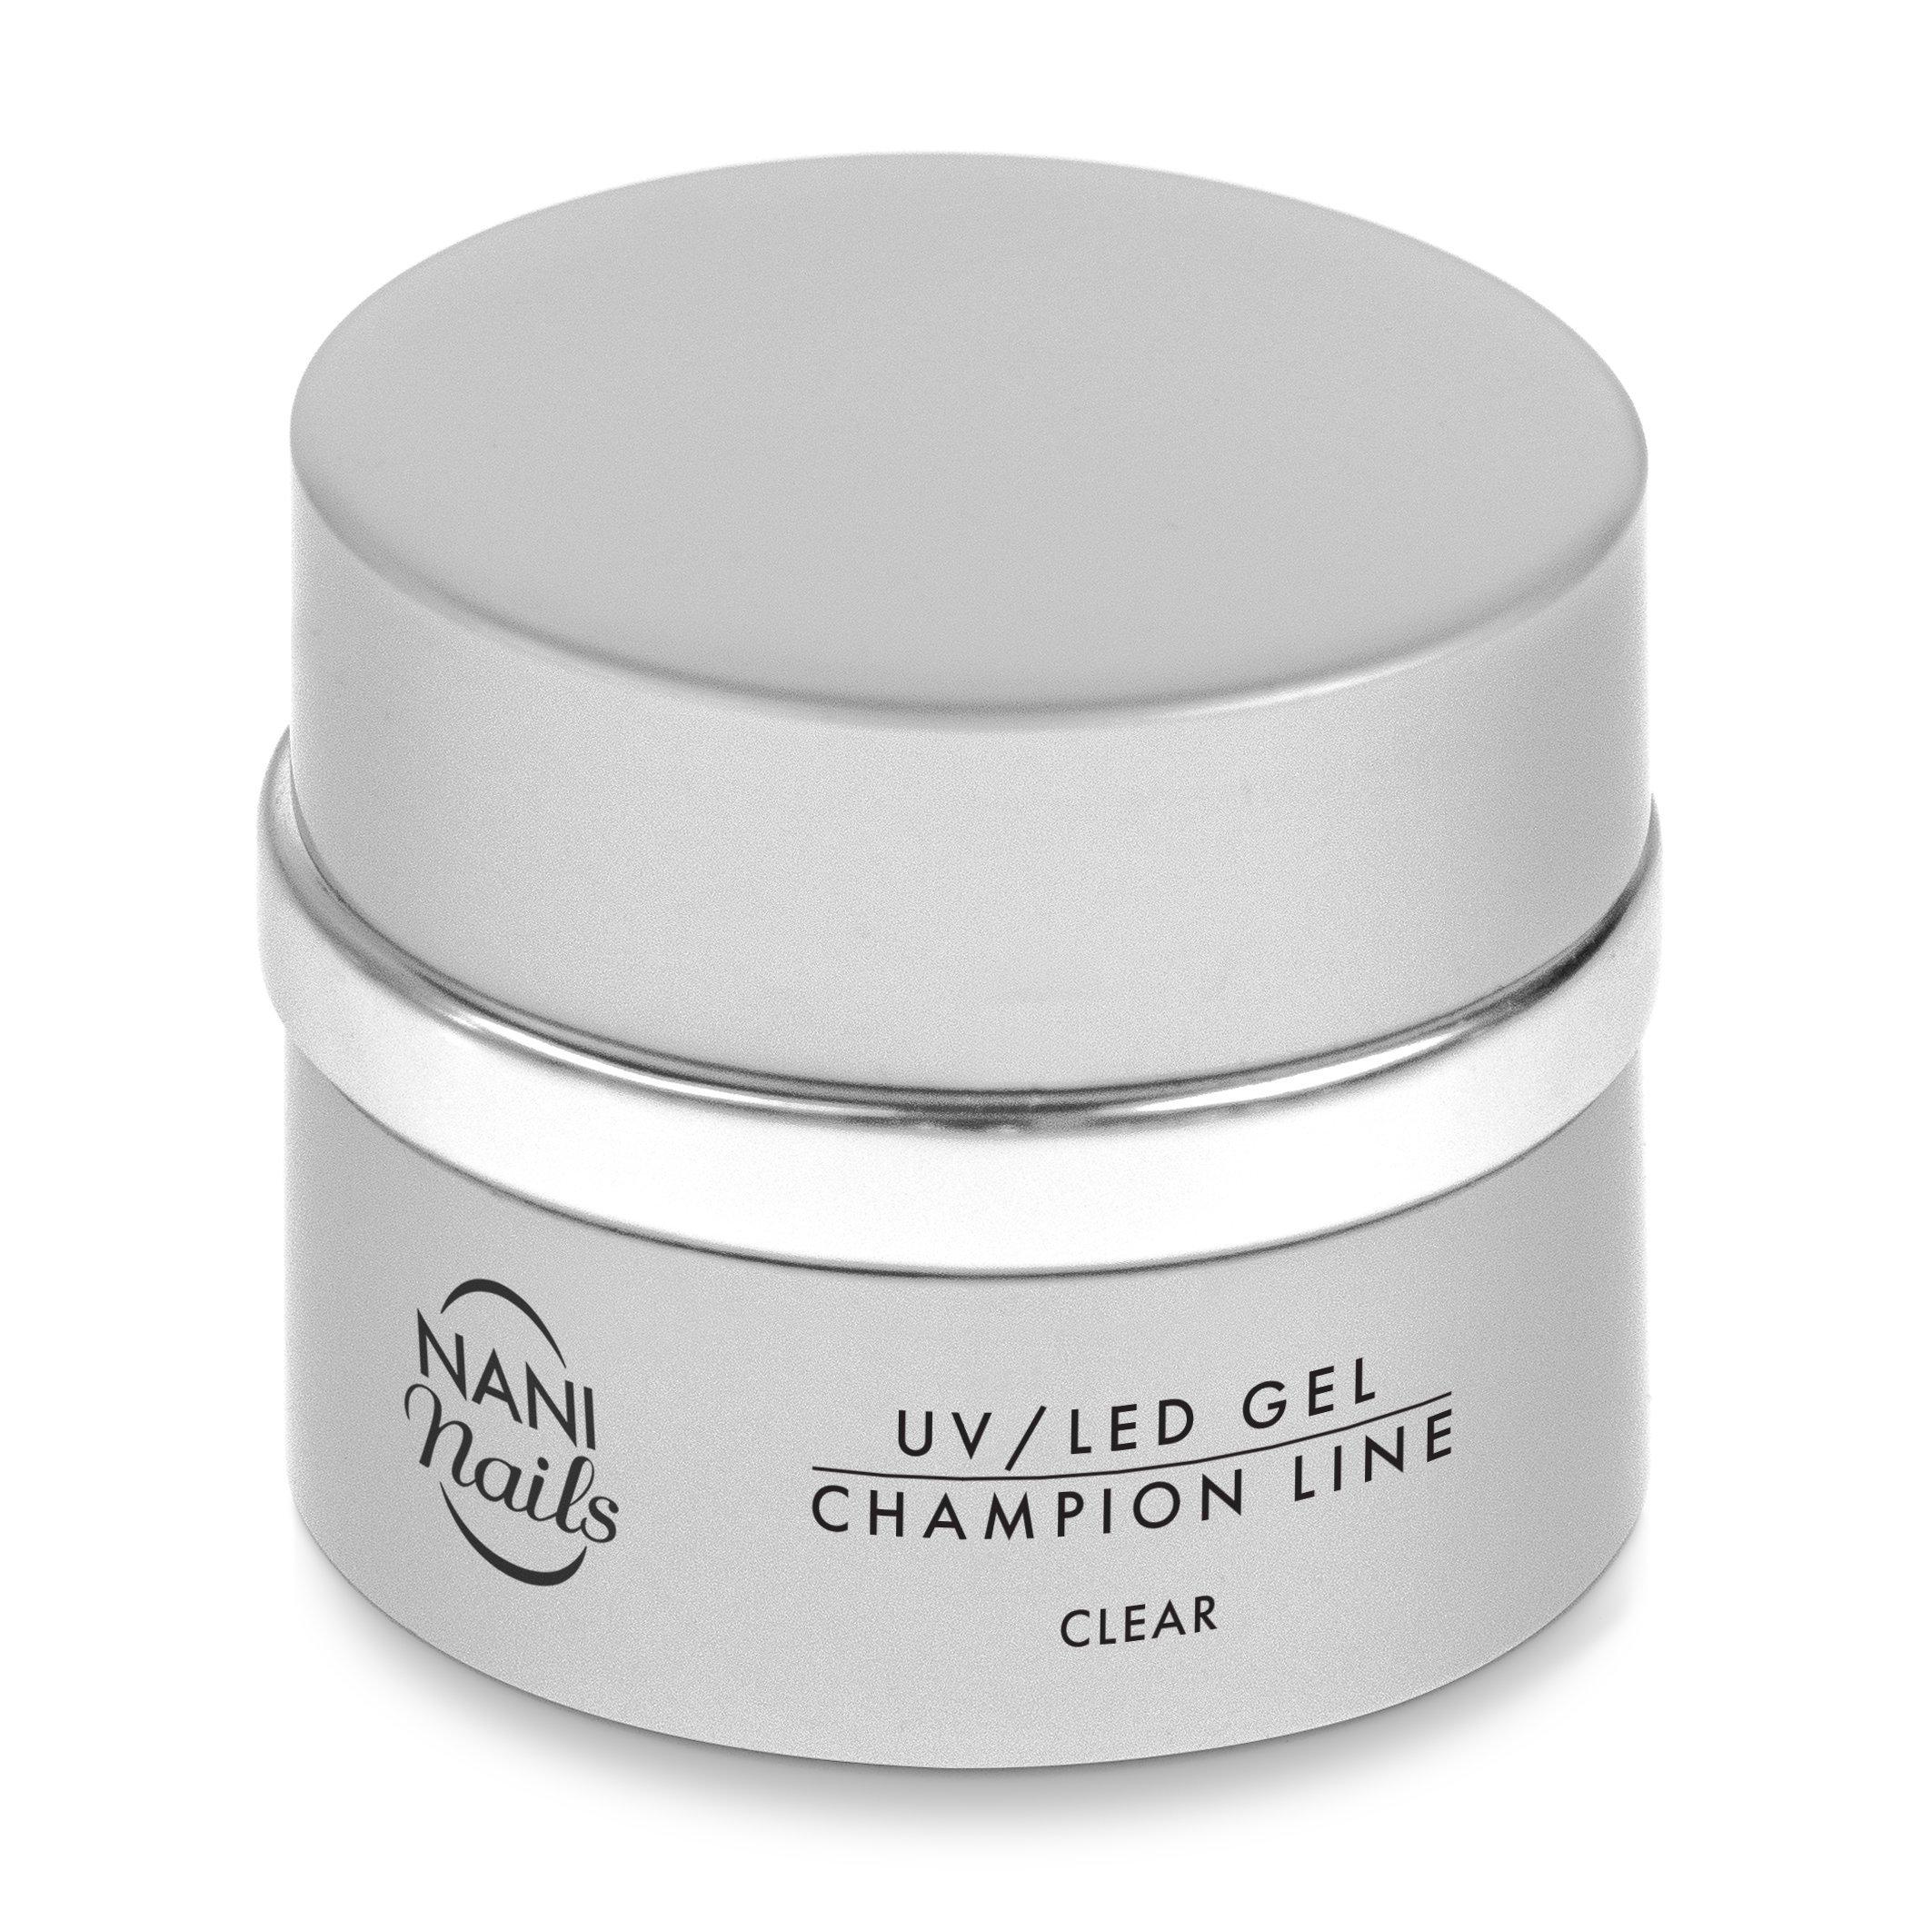 NANI UV/LED gél Champion Line 15 ml - Clear